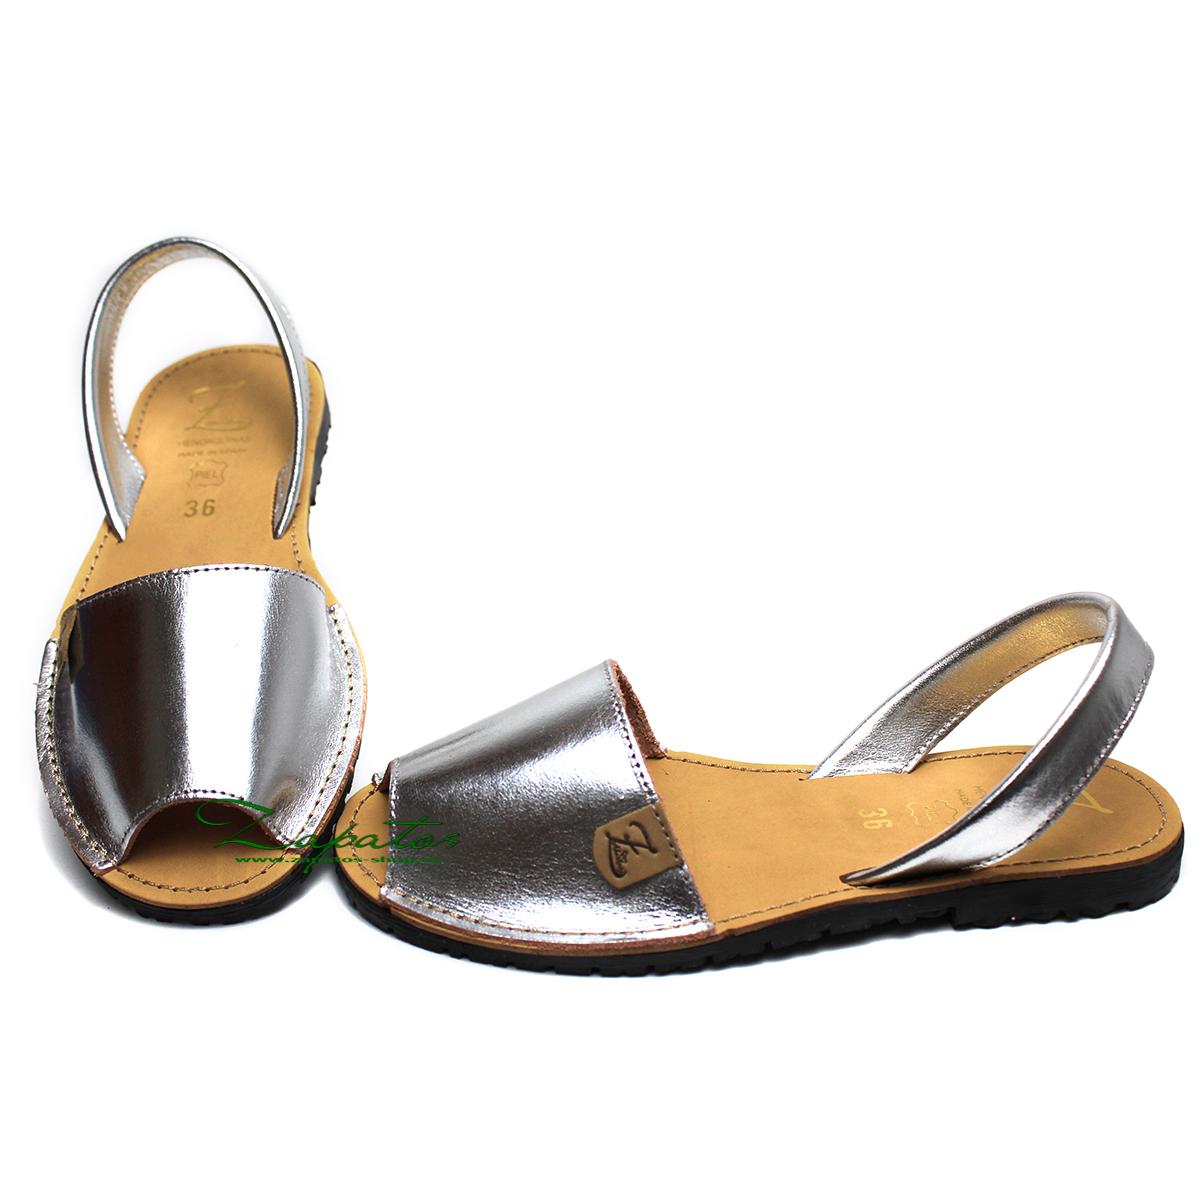 Абаркасы AB. Zapatos 3204 plomo